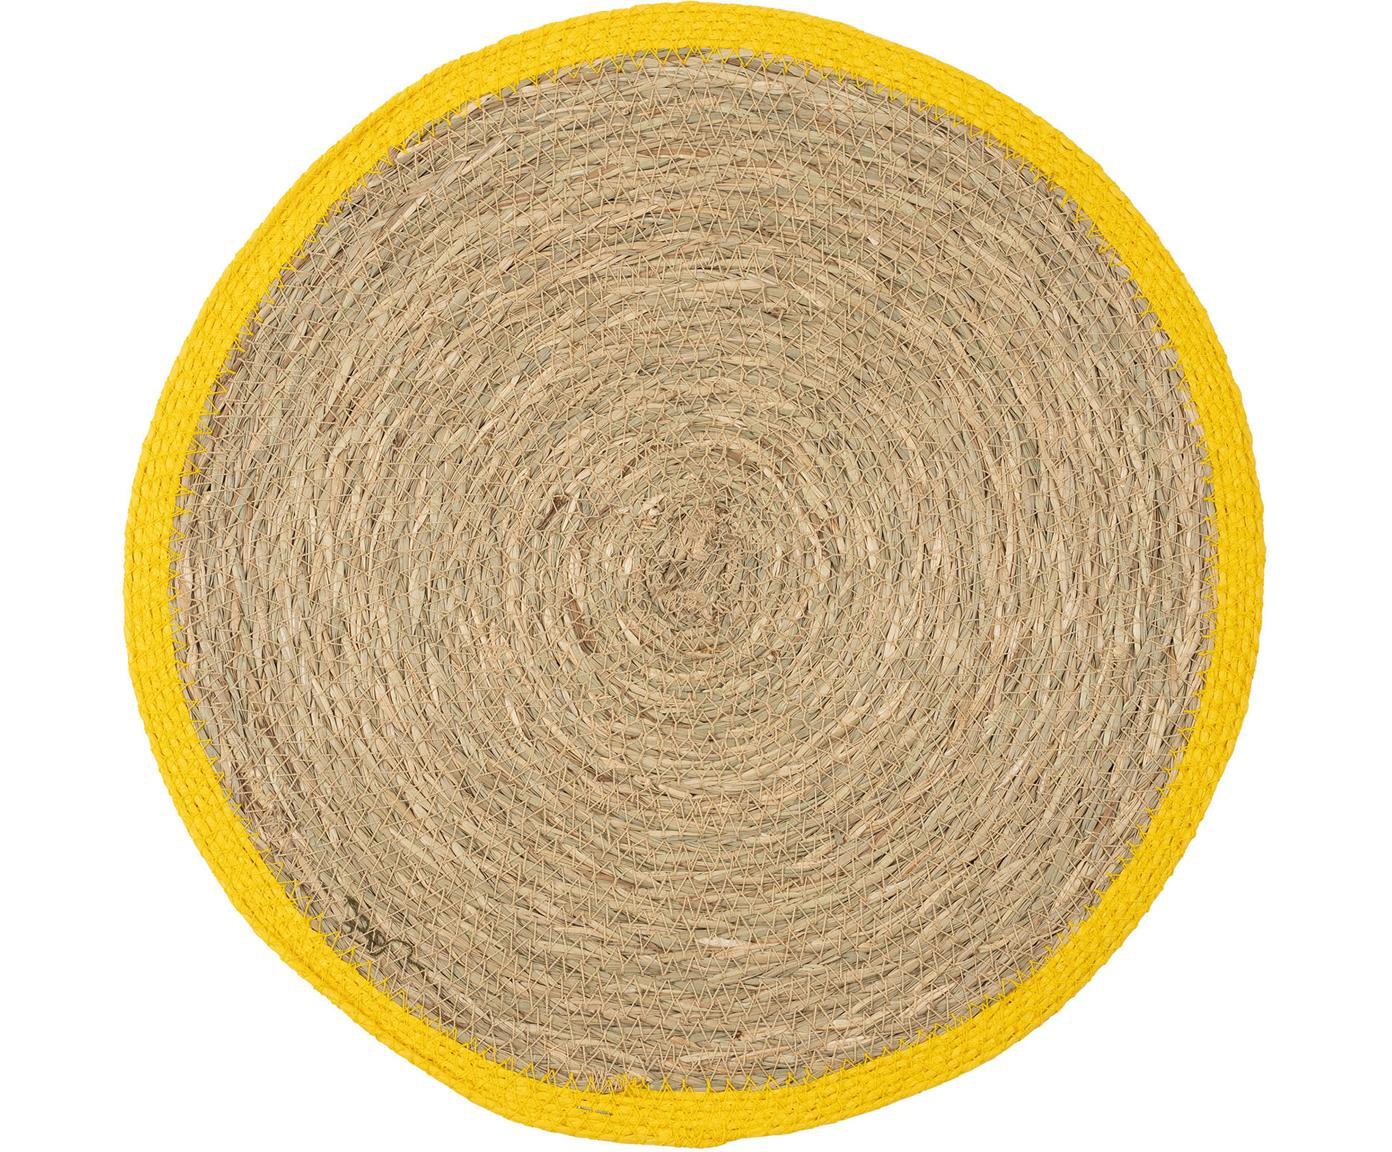 Tovaglietta americana rotonda Boho 2 pz, Alghe, Beige, giallo, Ø 35 cm